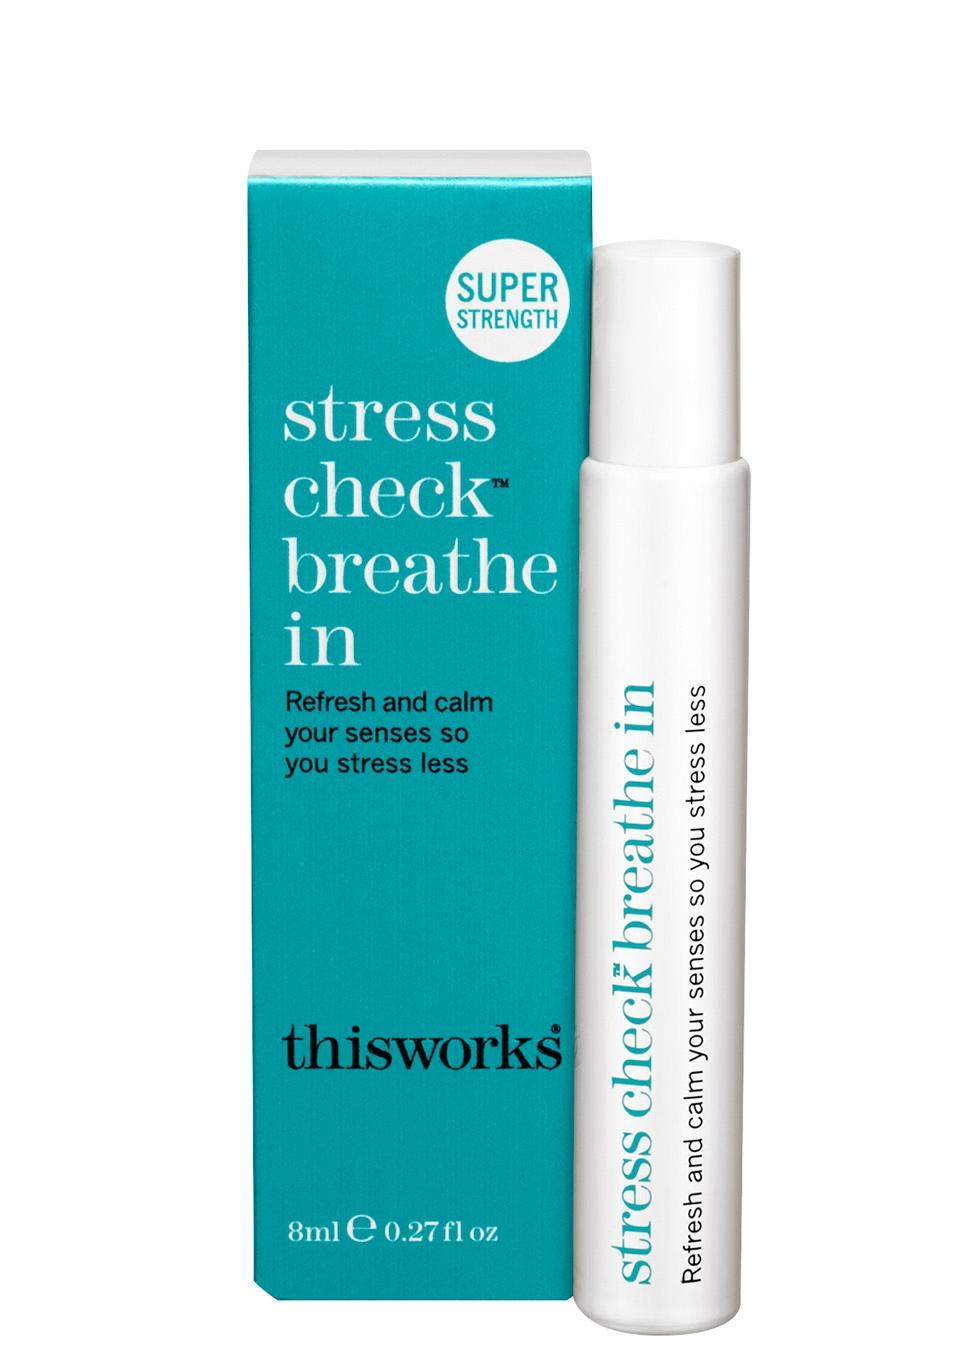 Stress Check Breathe In 8ml